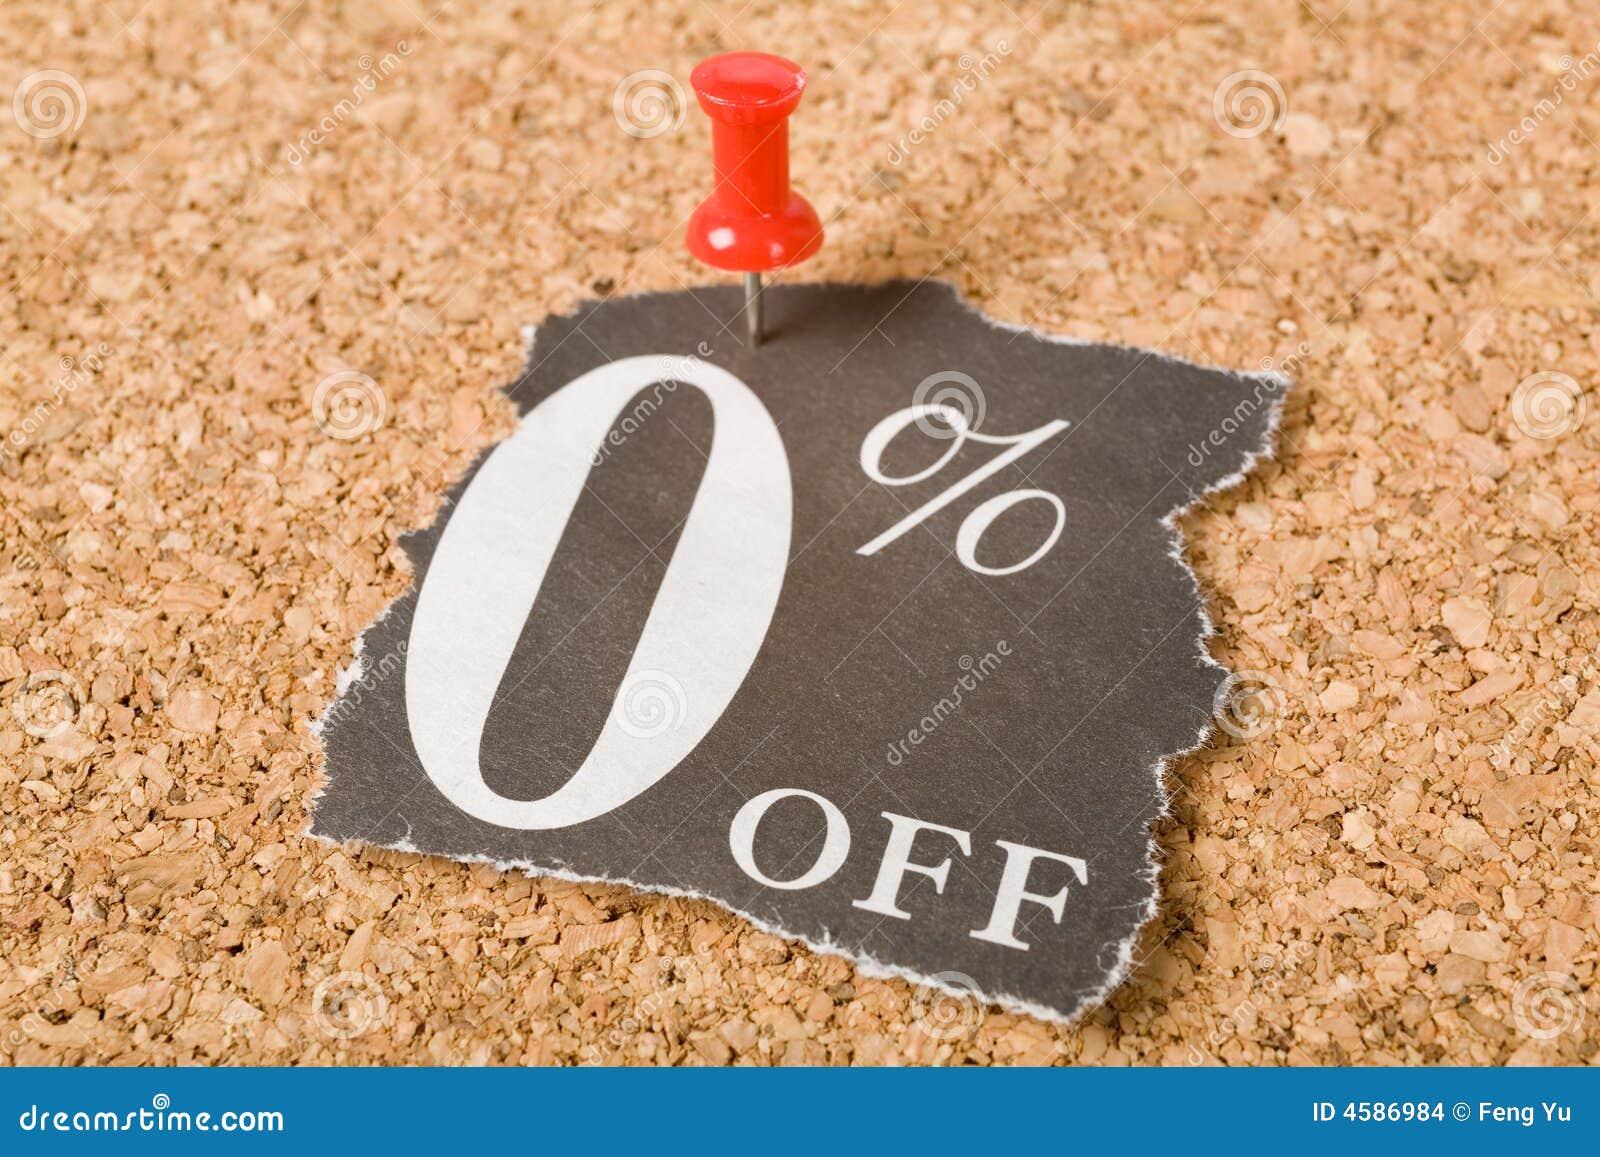 Off percent zero